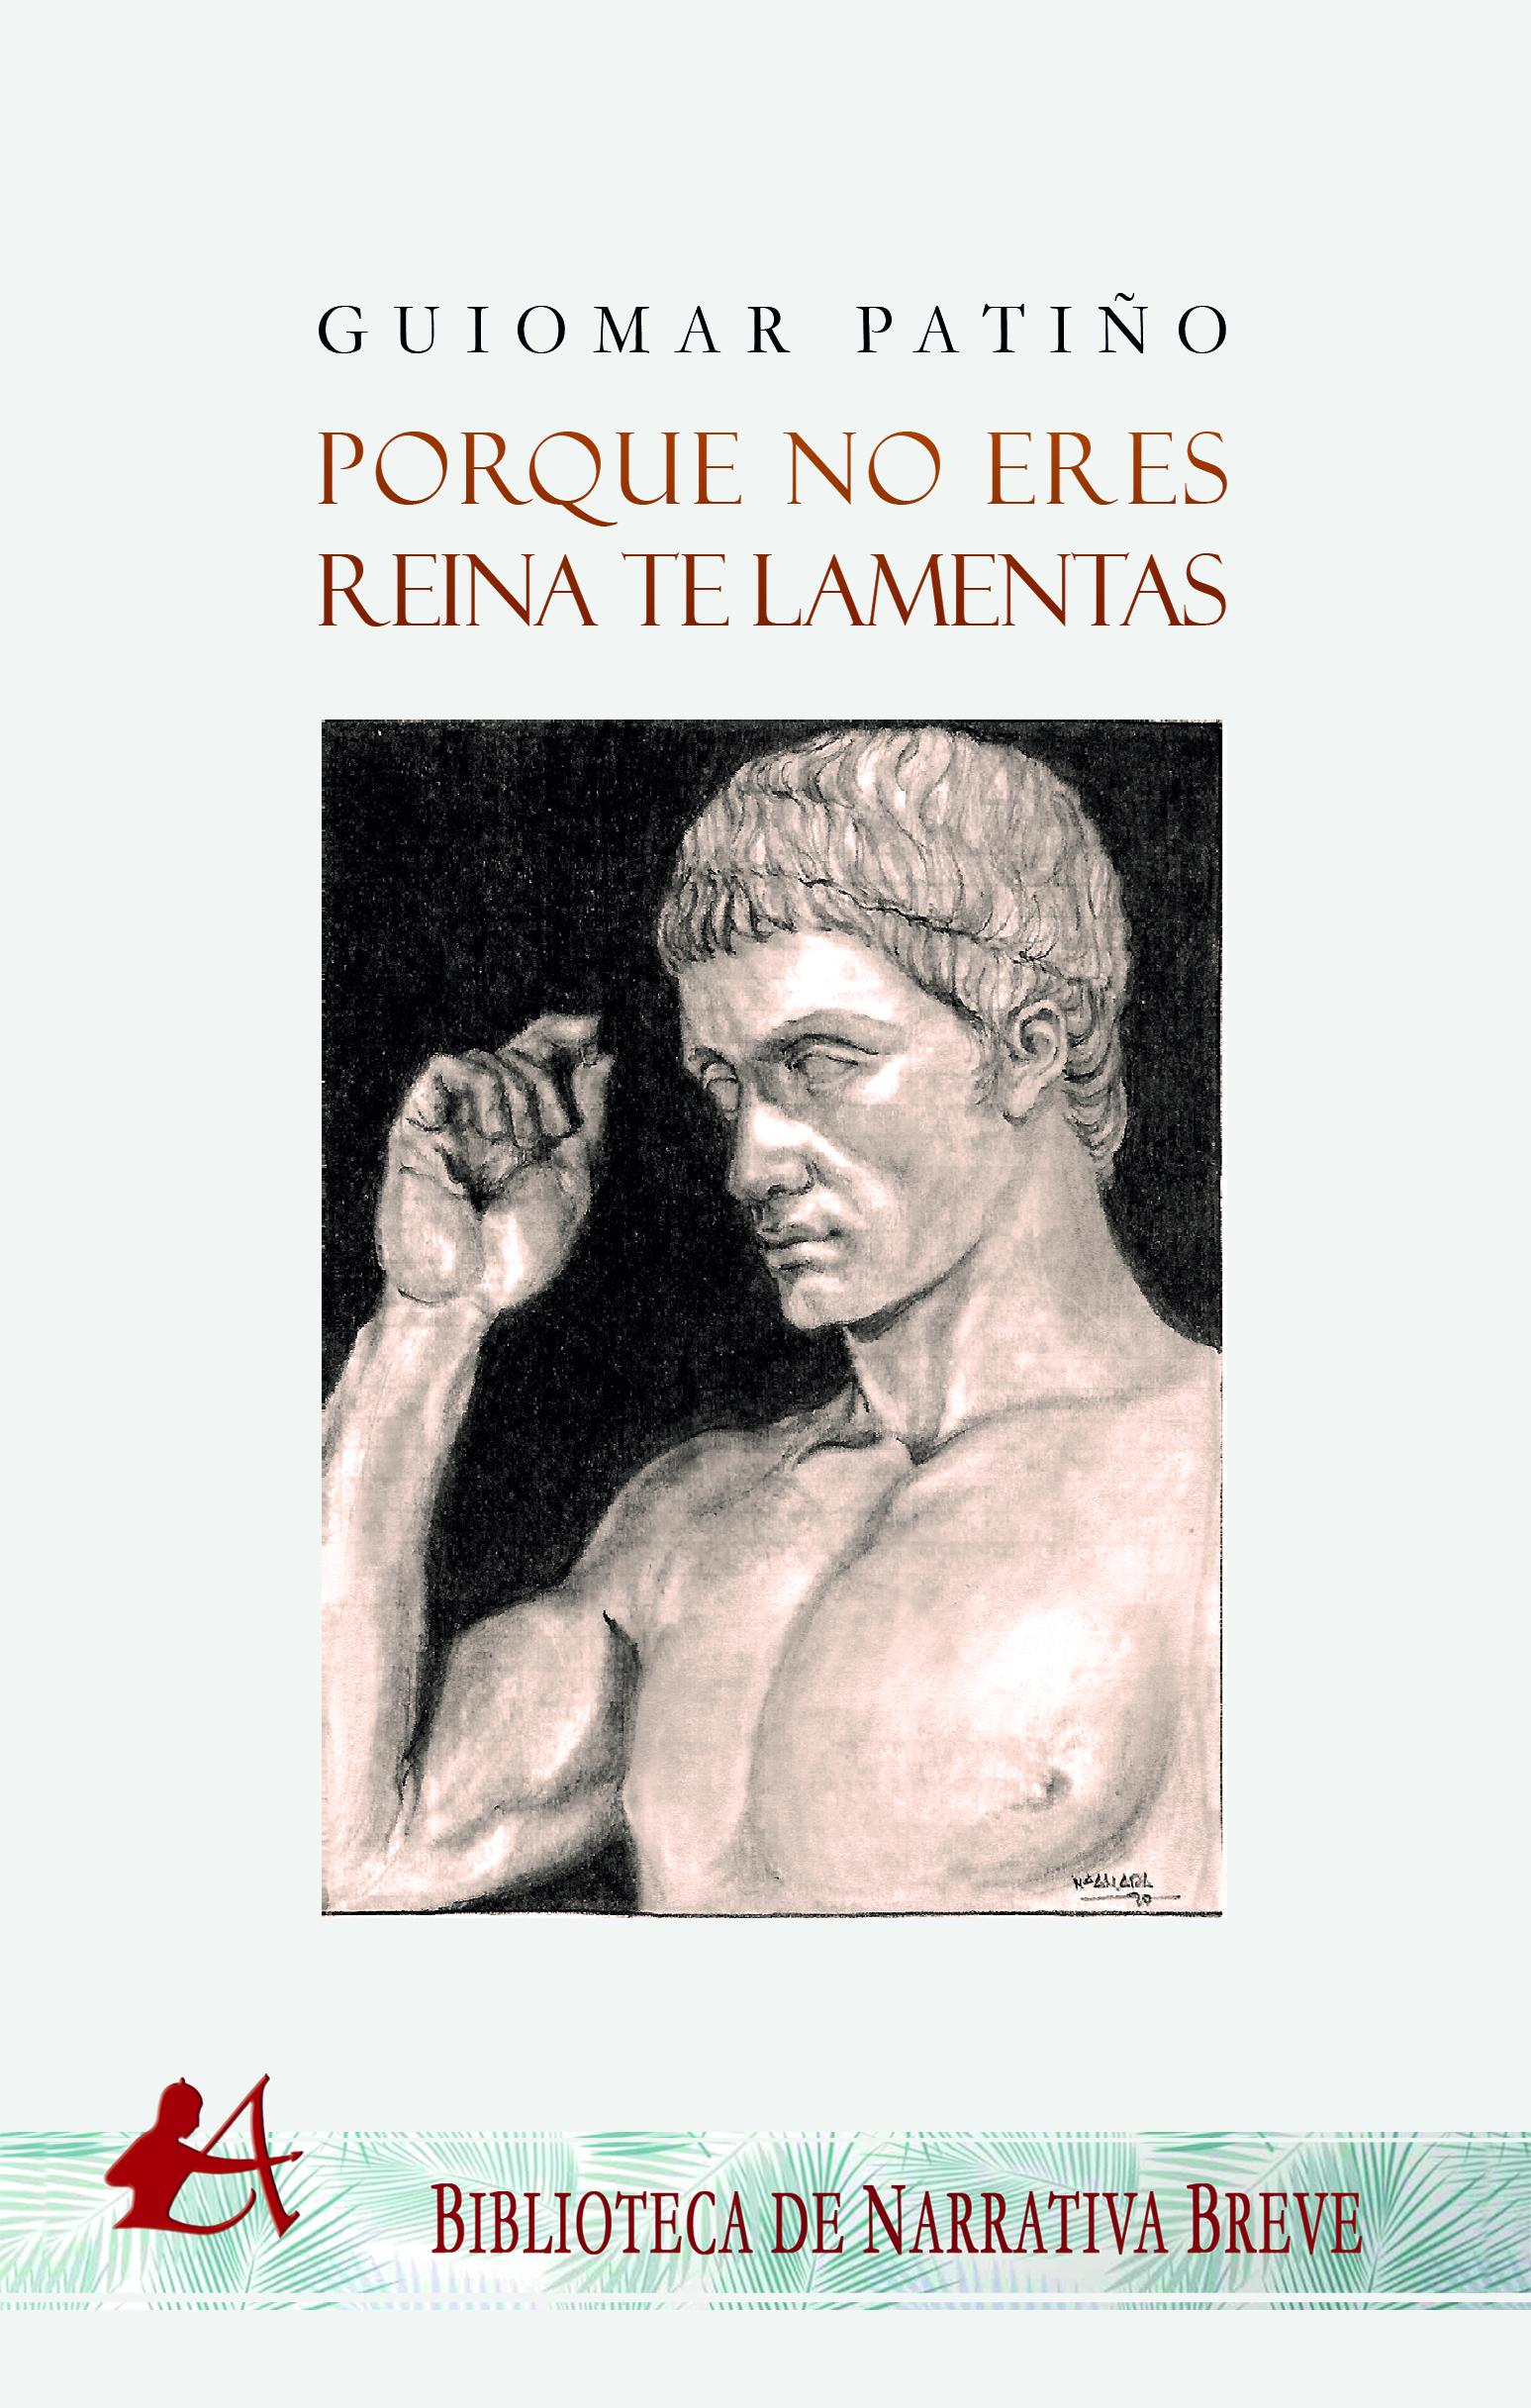 Portada del libro Porque no eres reina te lamentas de Guiomara Patiño. Editorial Adarve, Escritores de hoy